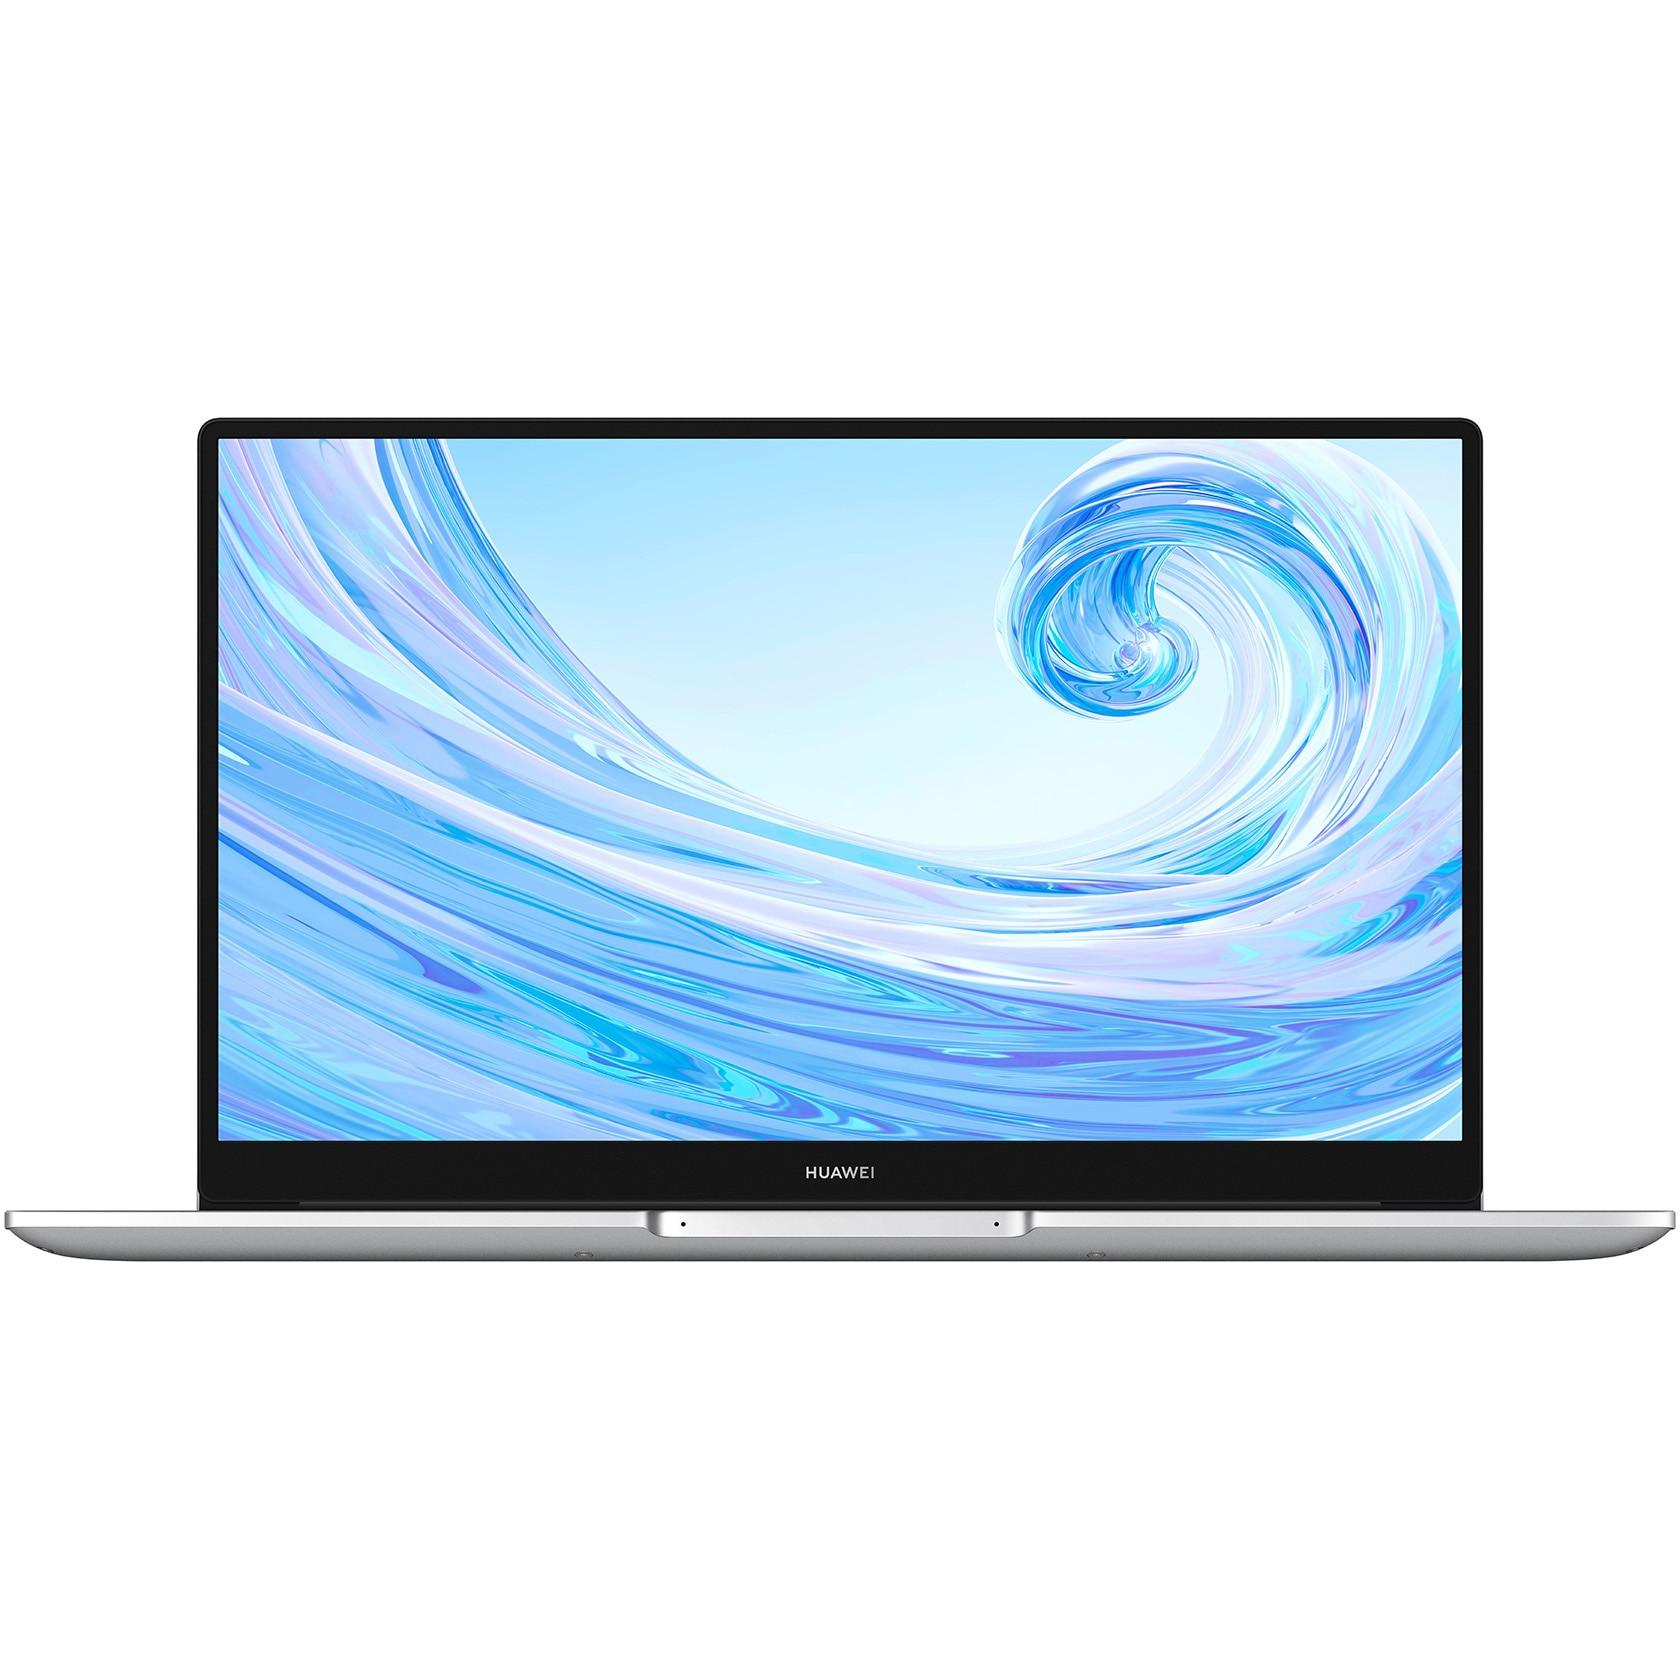 "Fotografie Laptop ultraportabil Huawei MateBook D15 2020 cu procesor AMD Ryzen™ 7 3700U pana la 4.00 GHz, 15.6"", Full HD, 8GB, 512GB SSD, AMD Radeon Graphics, Windows Home, Silver"